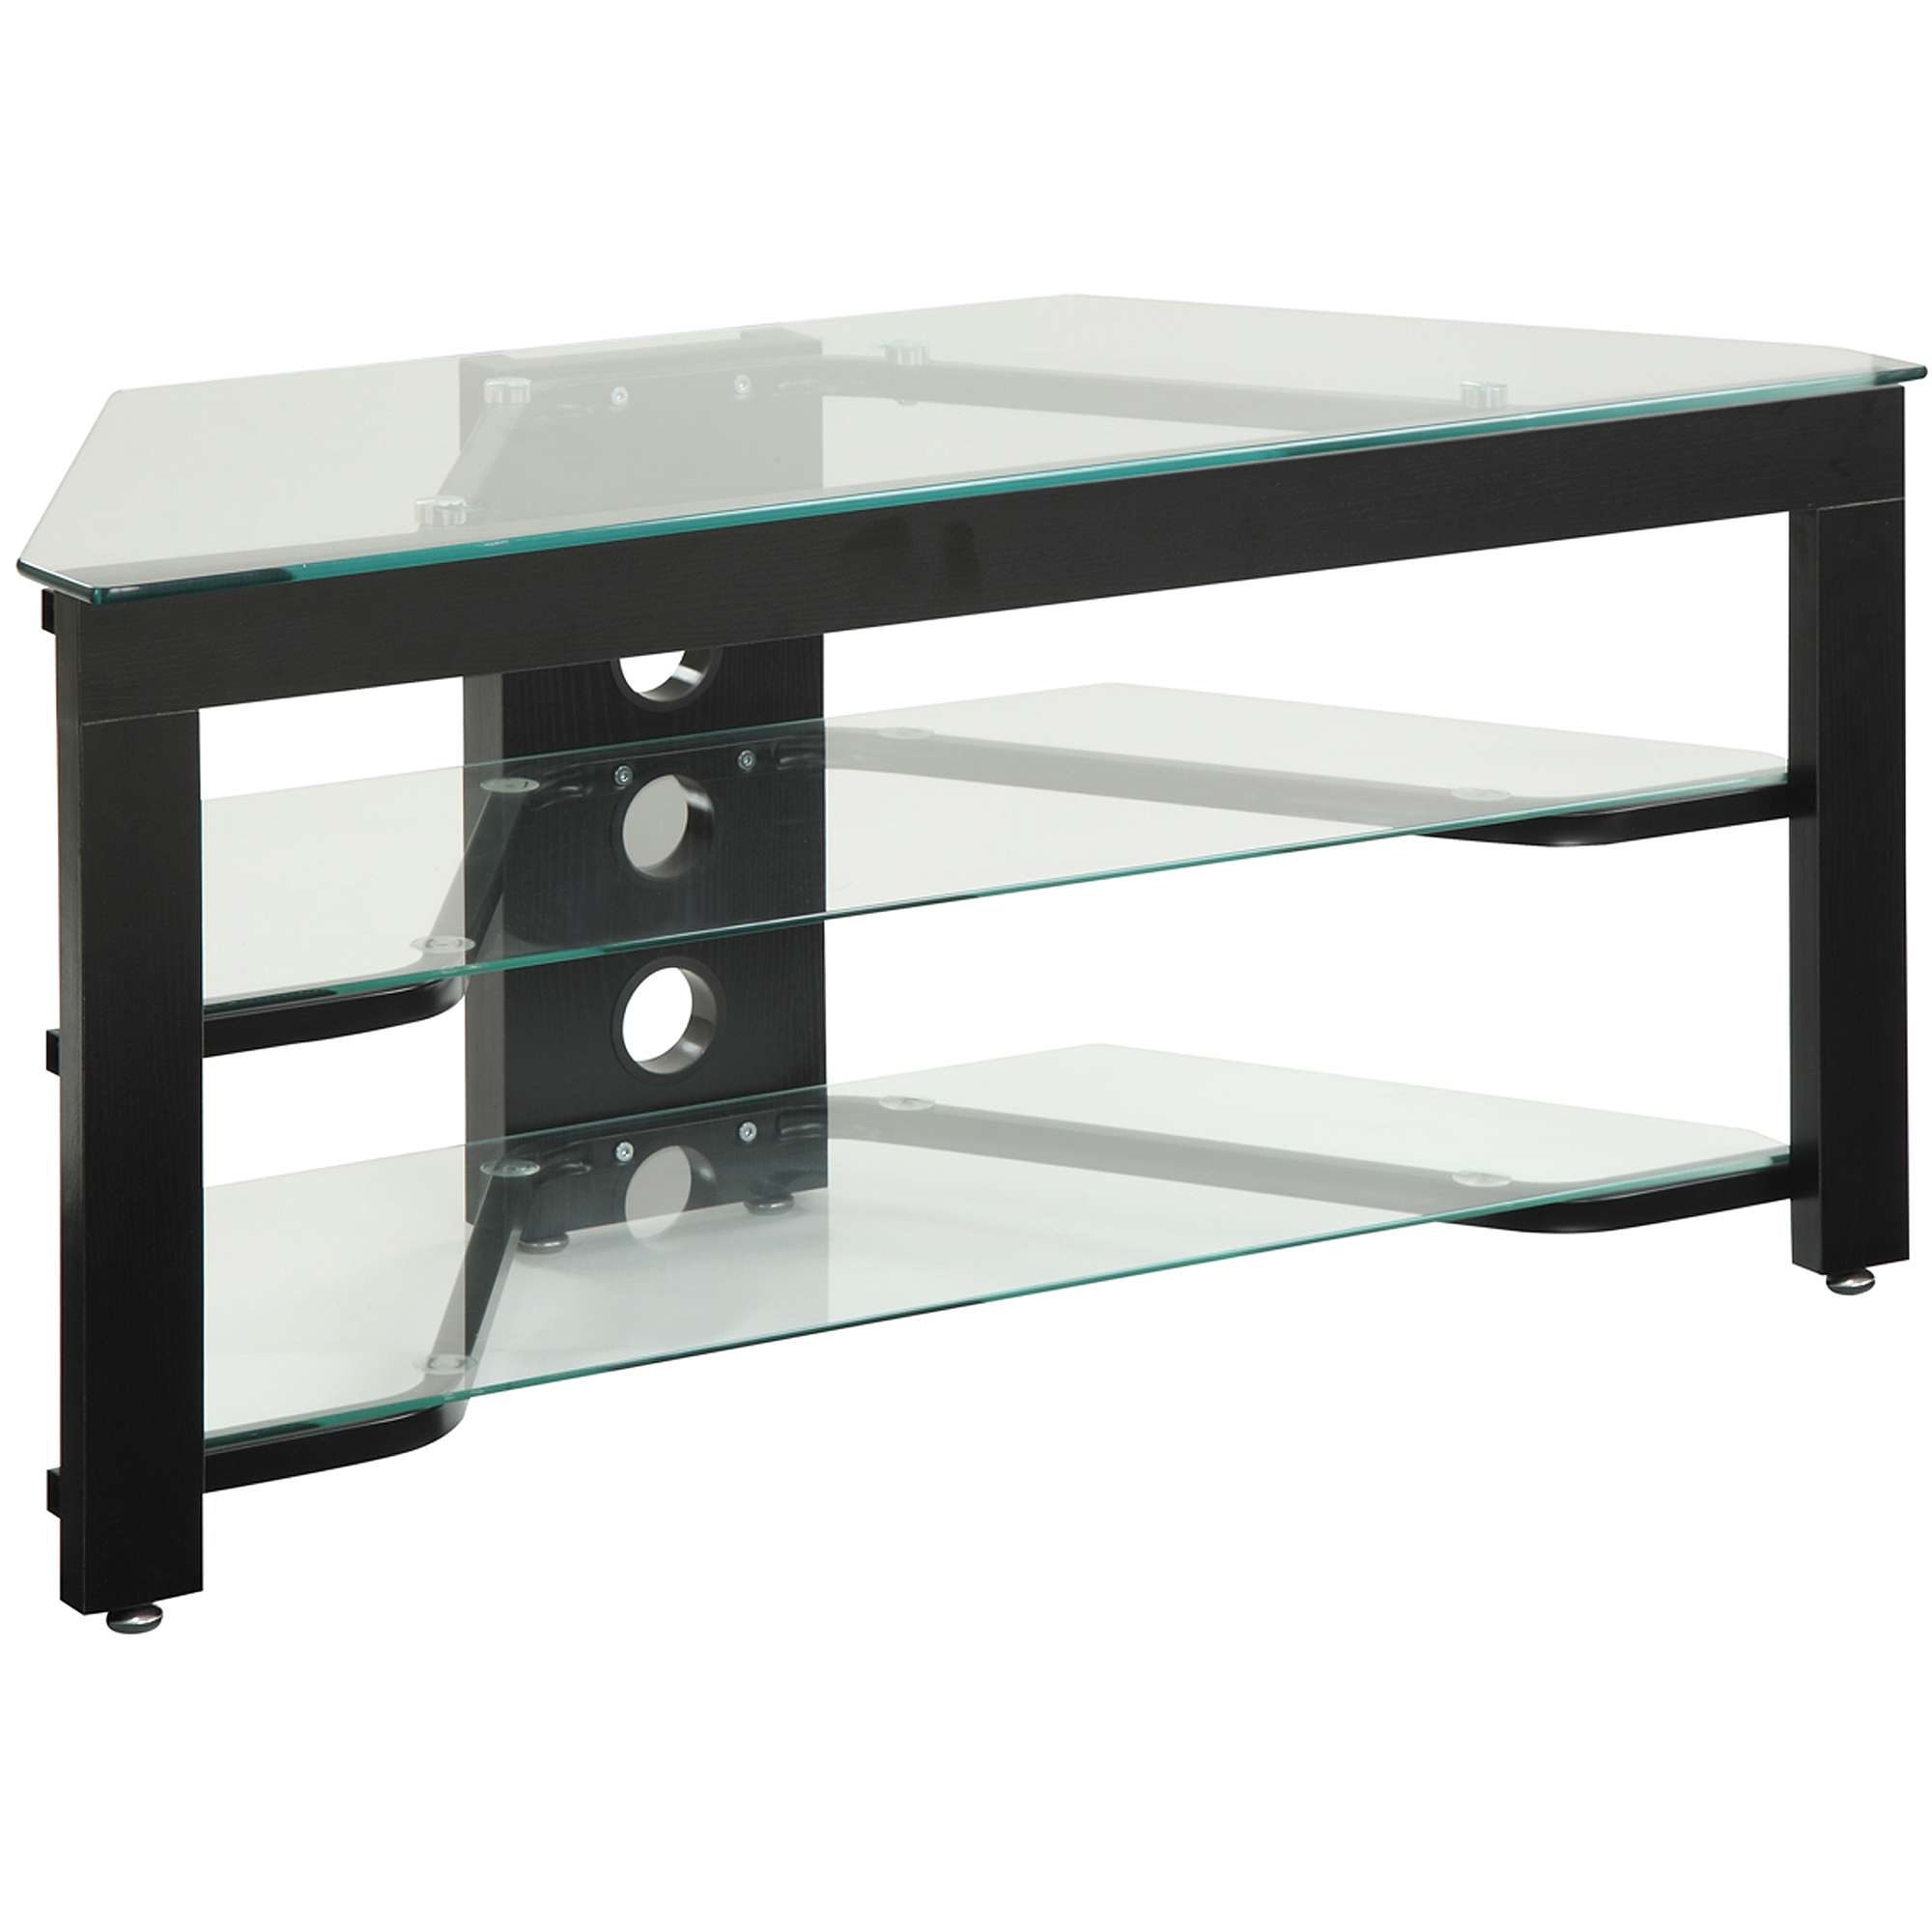 Tv : Gratify Tv Cabinets With Glass Doors Uk Unforeseen Black Intended For Black Corner Tv Cabinets With Glass Doors (View 17 of 20)